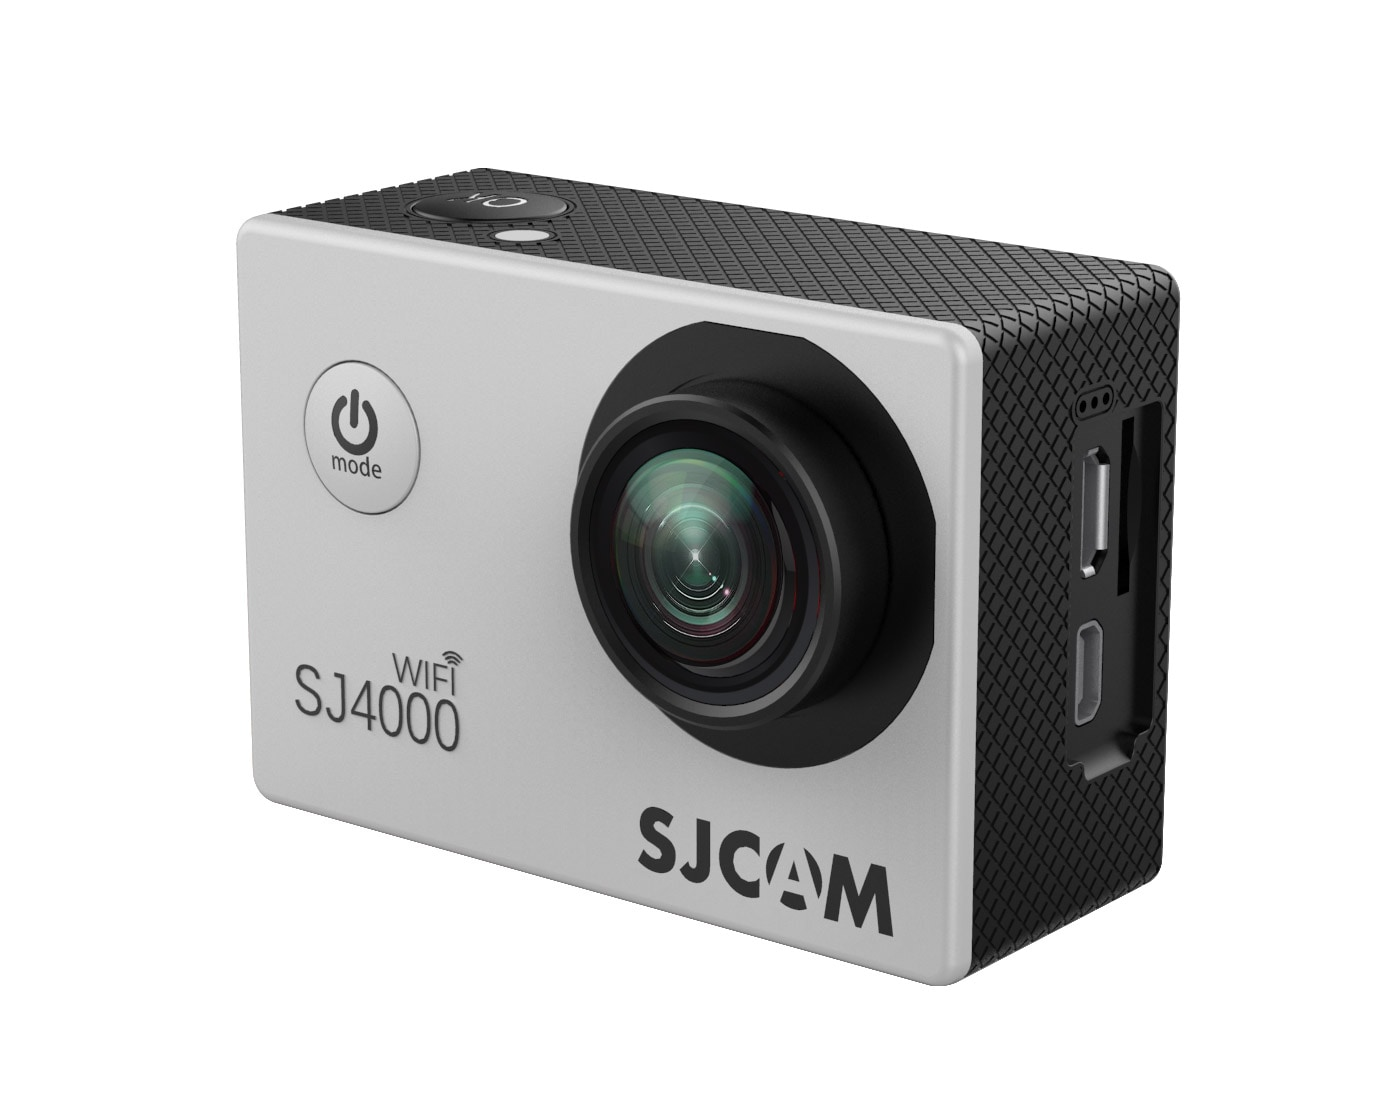 SJCAM SJ4000 WIFI Action Camera FHD1080P waterproof Underwater Camera 12MP Sports Camcorder  Red - 6